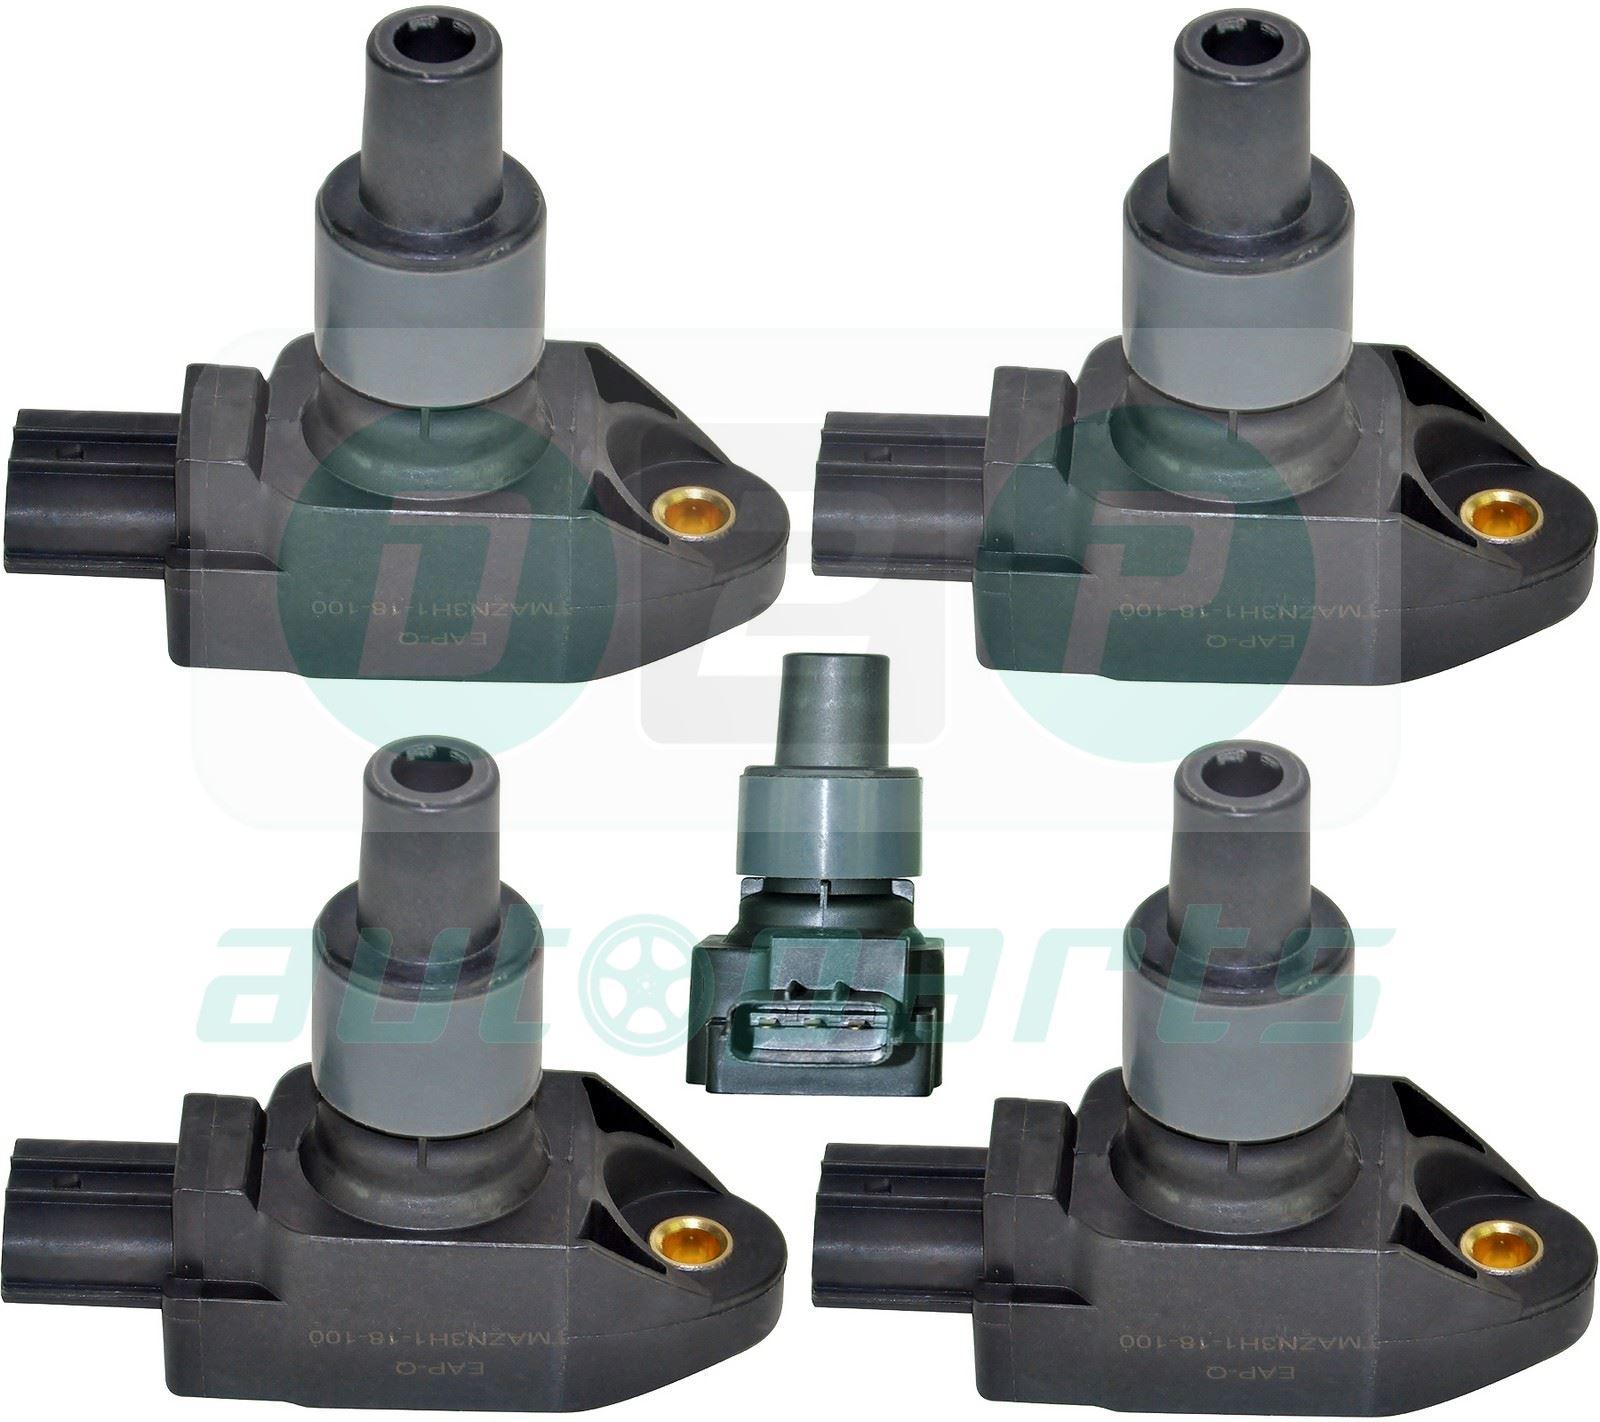 for mazda rx 8 rx8 rx 8 2 6 2003 2012 ignition coils. Black Bedroom Furniture Sets. Home Design Ideas